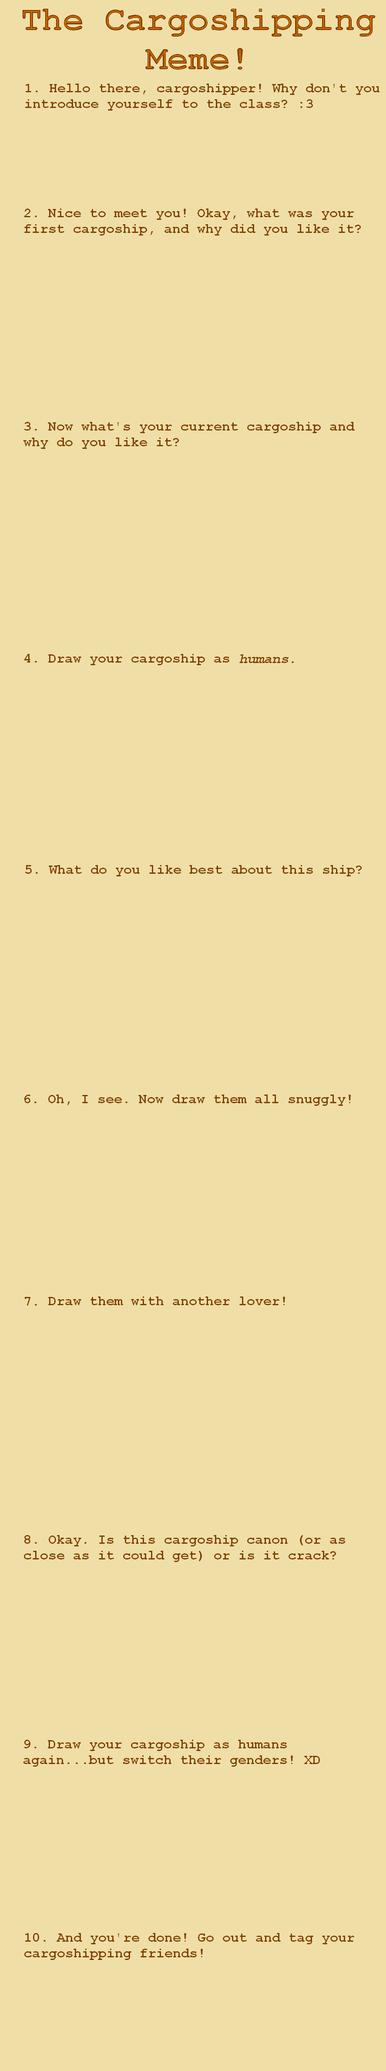 Cargoshipping Meme by Lady-Moth